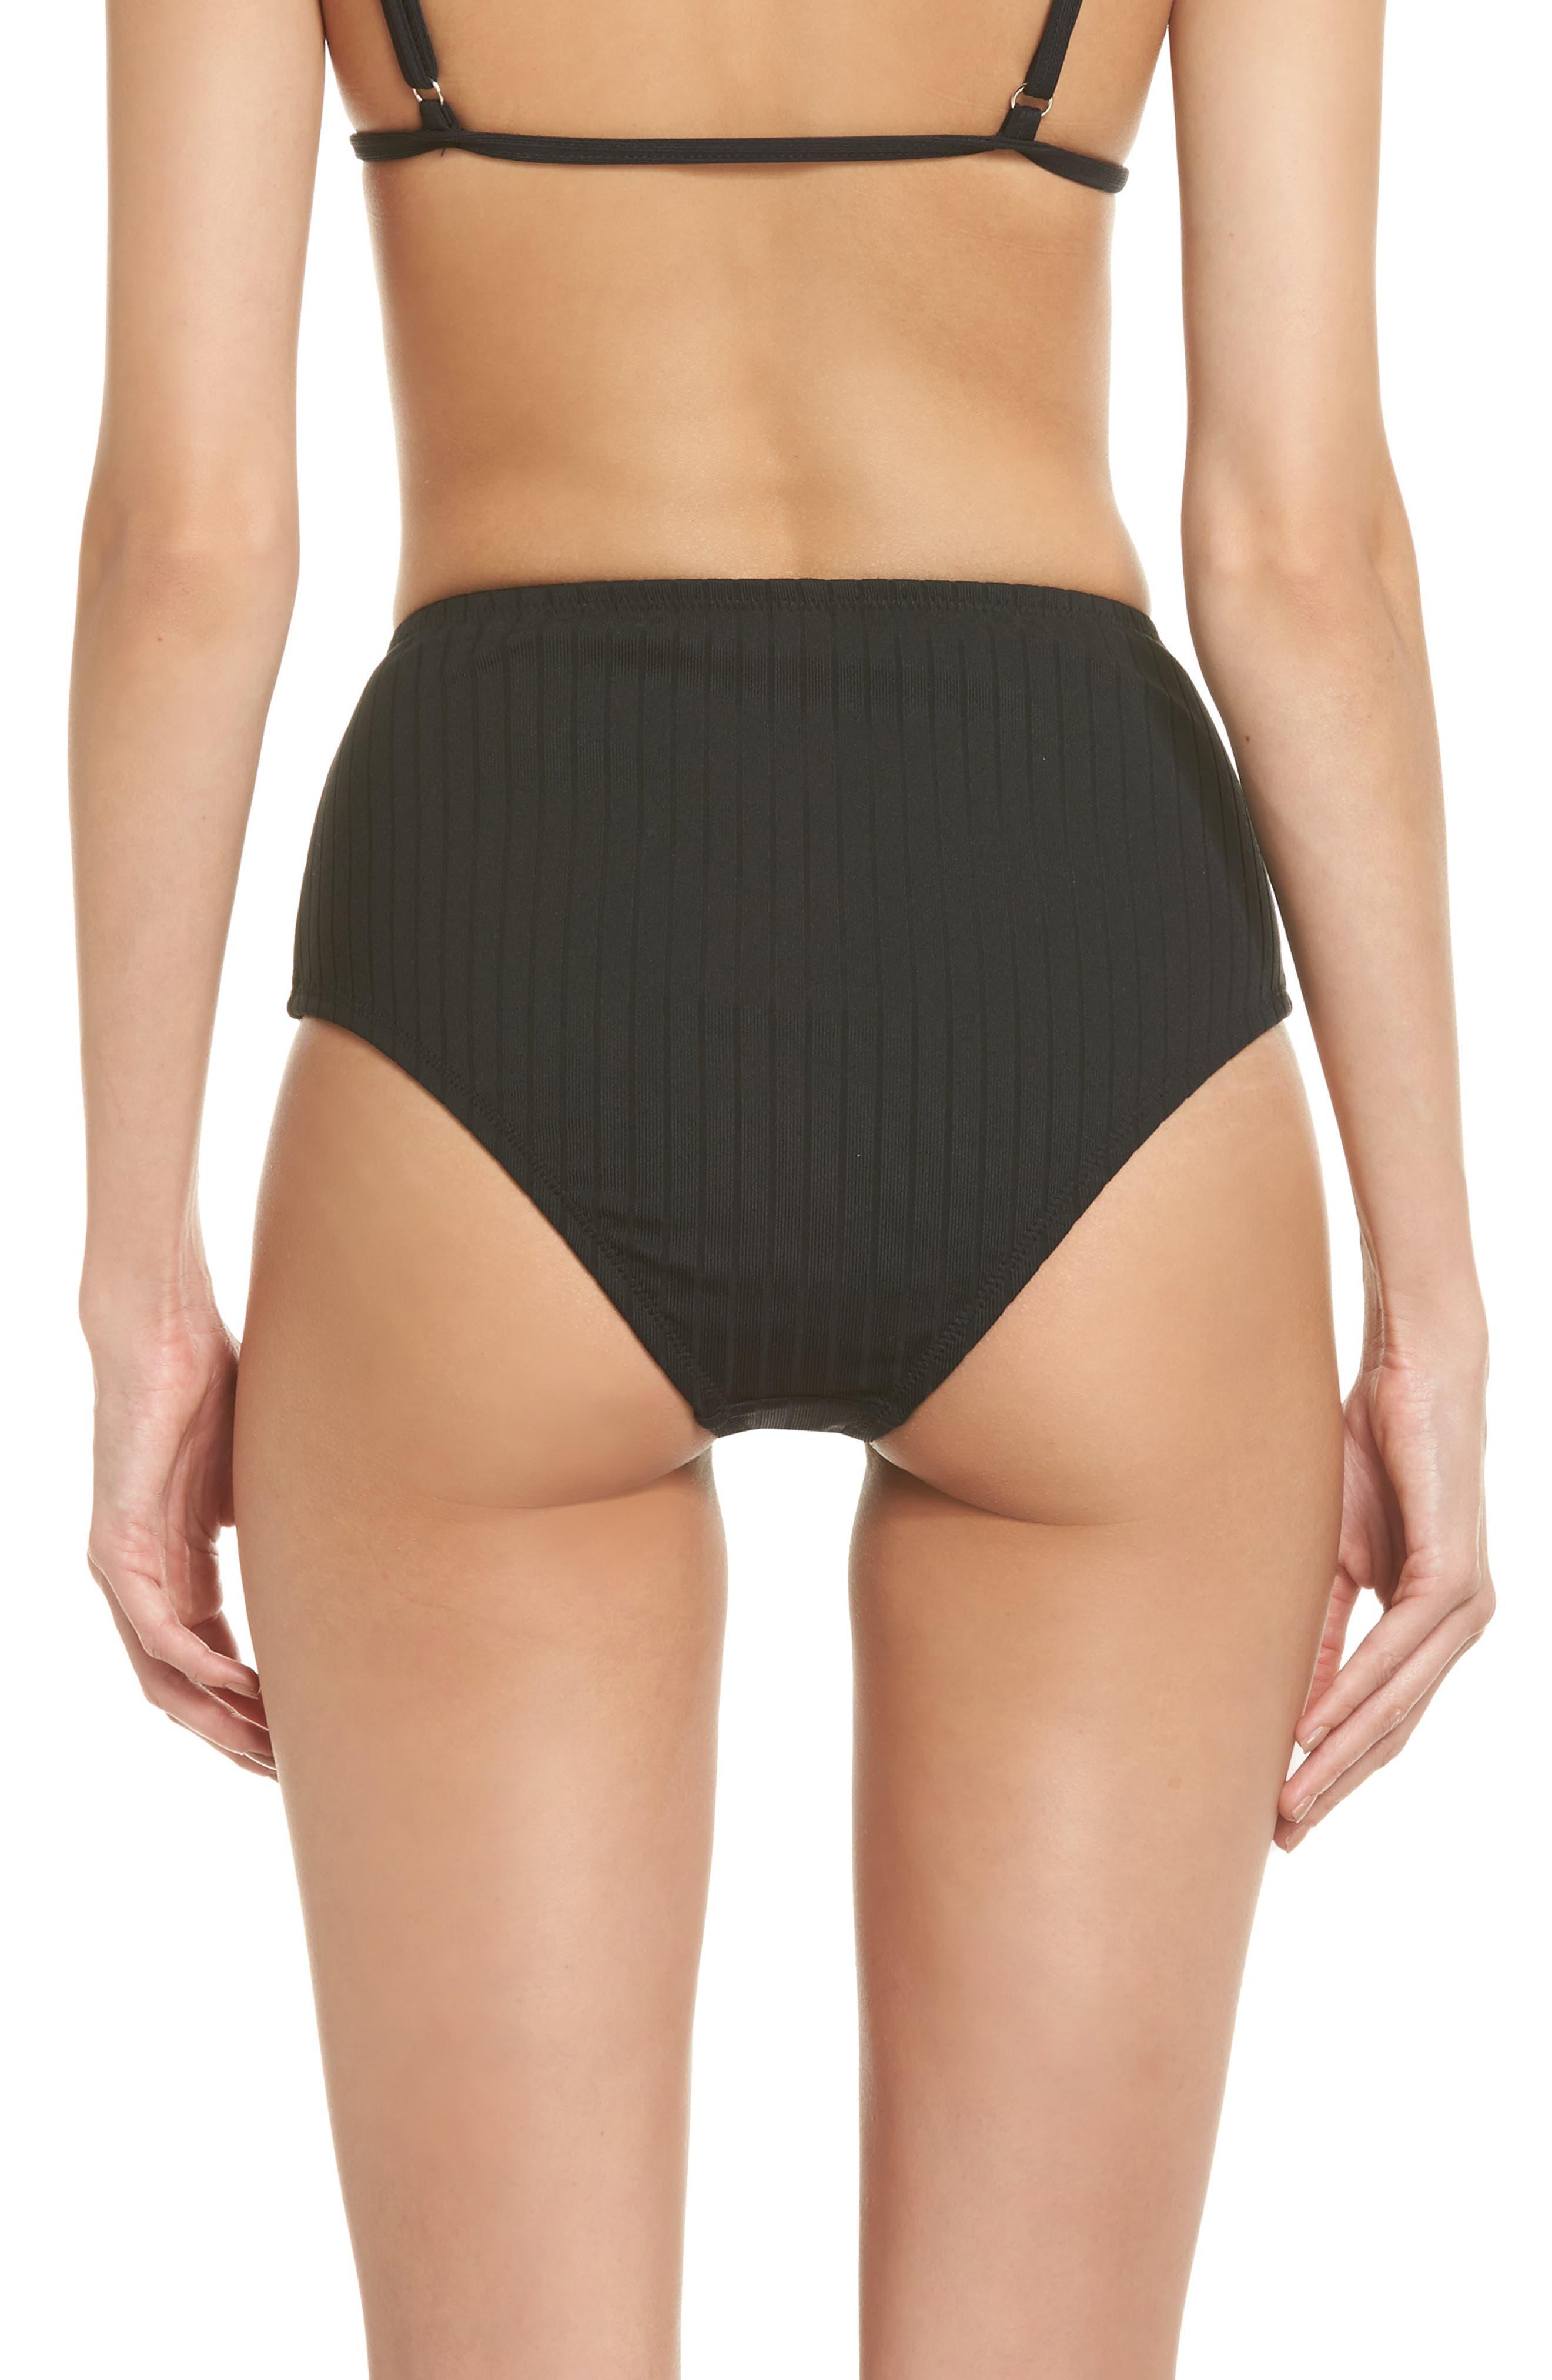 Westwood High Waist Bikini Bottoms,                             Alternate thumbnail 2, color,                             001